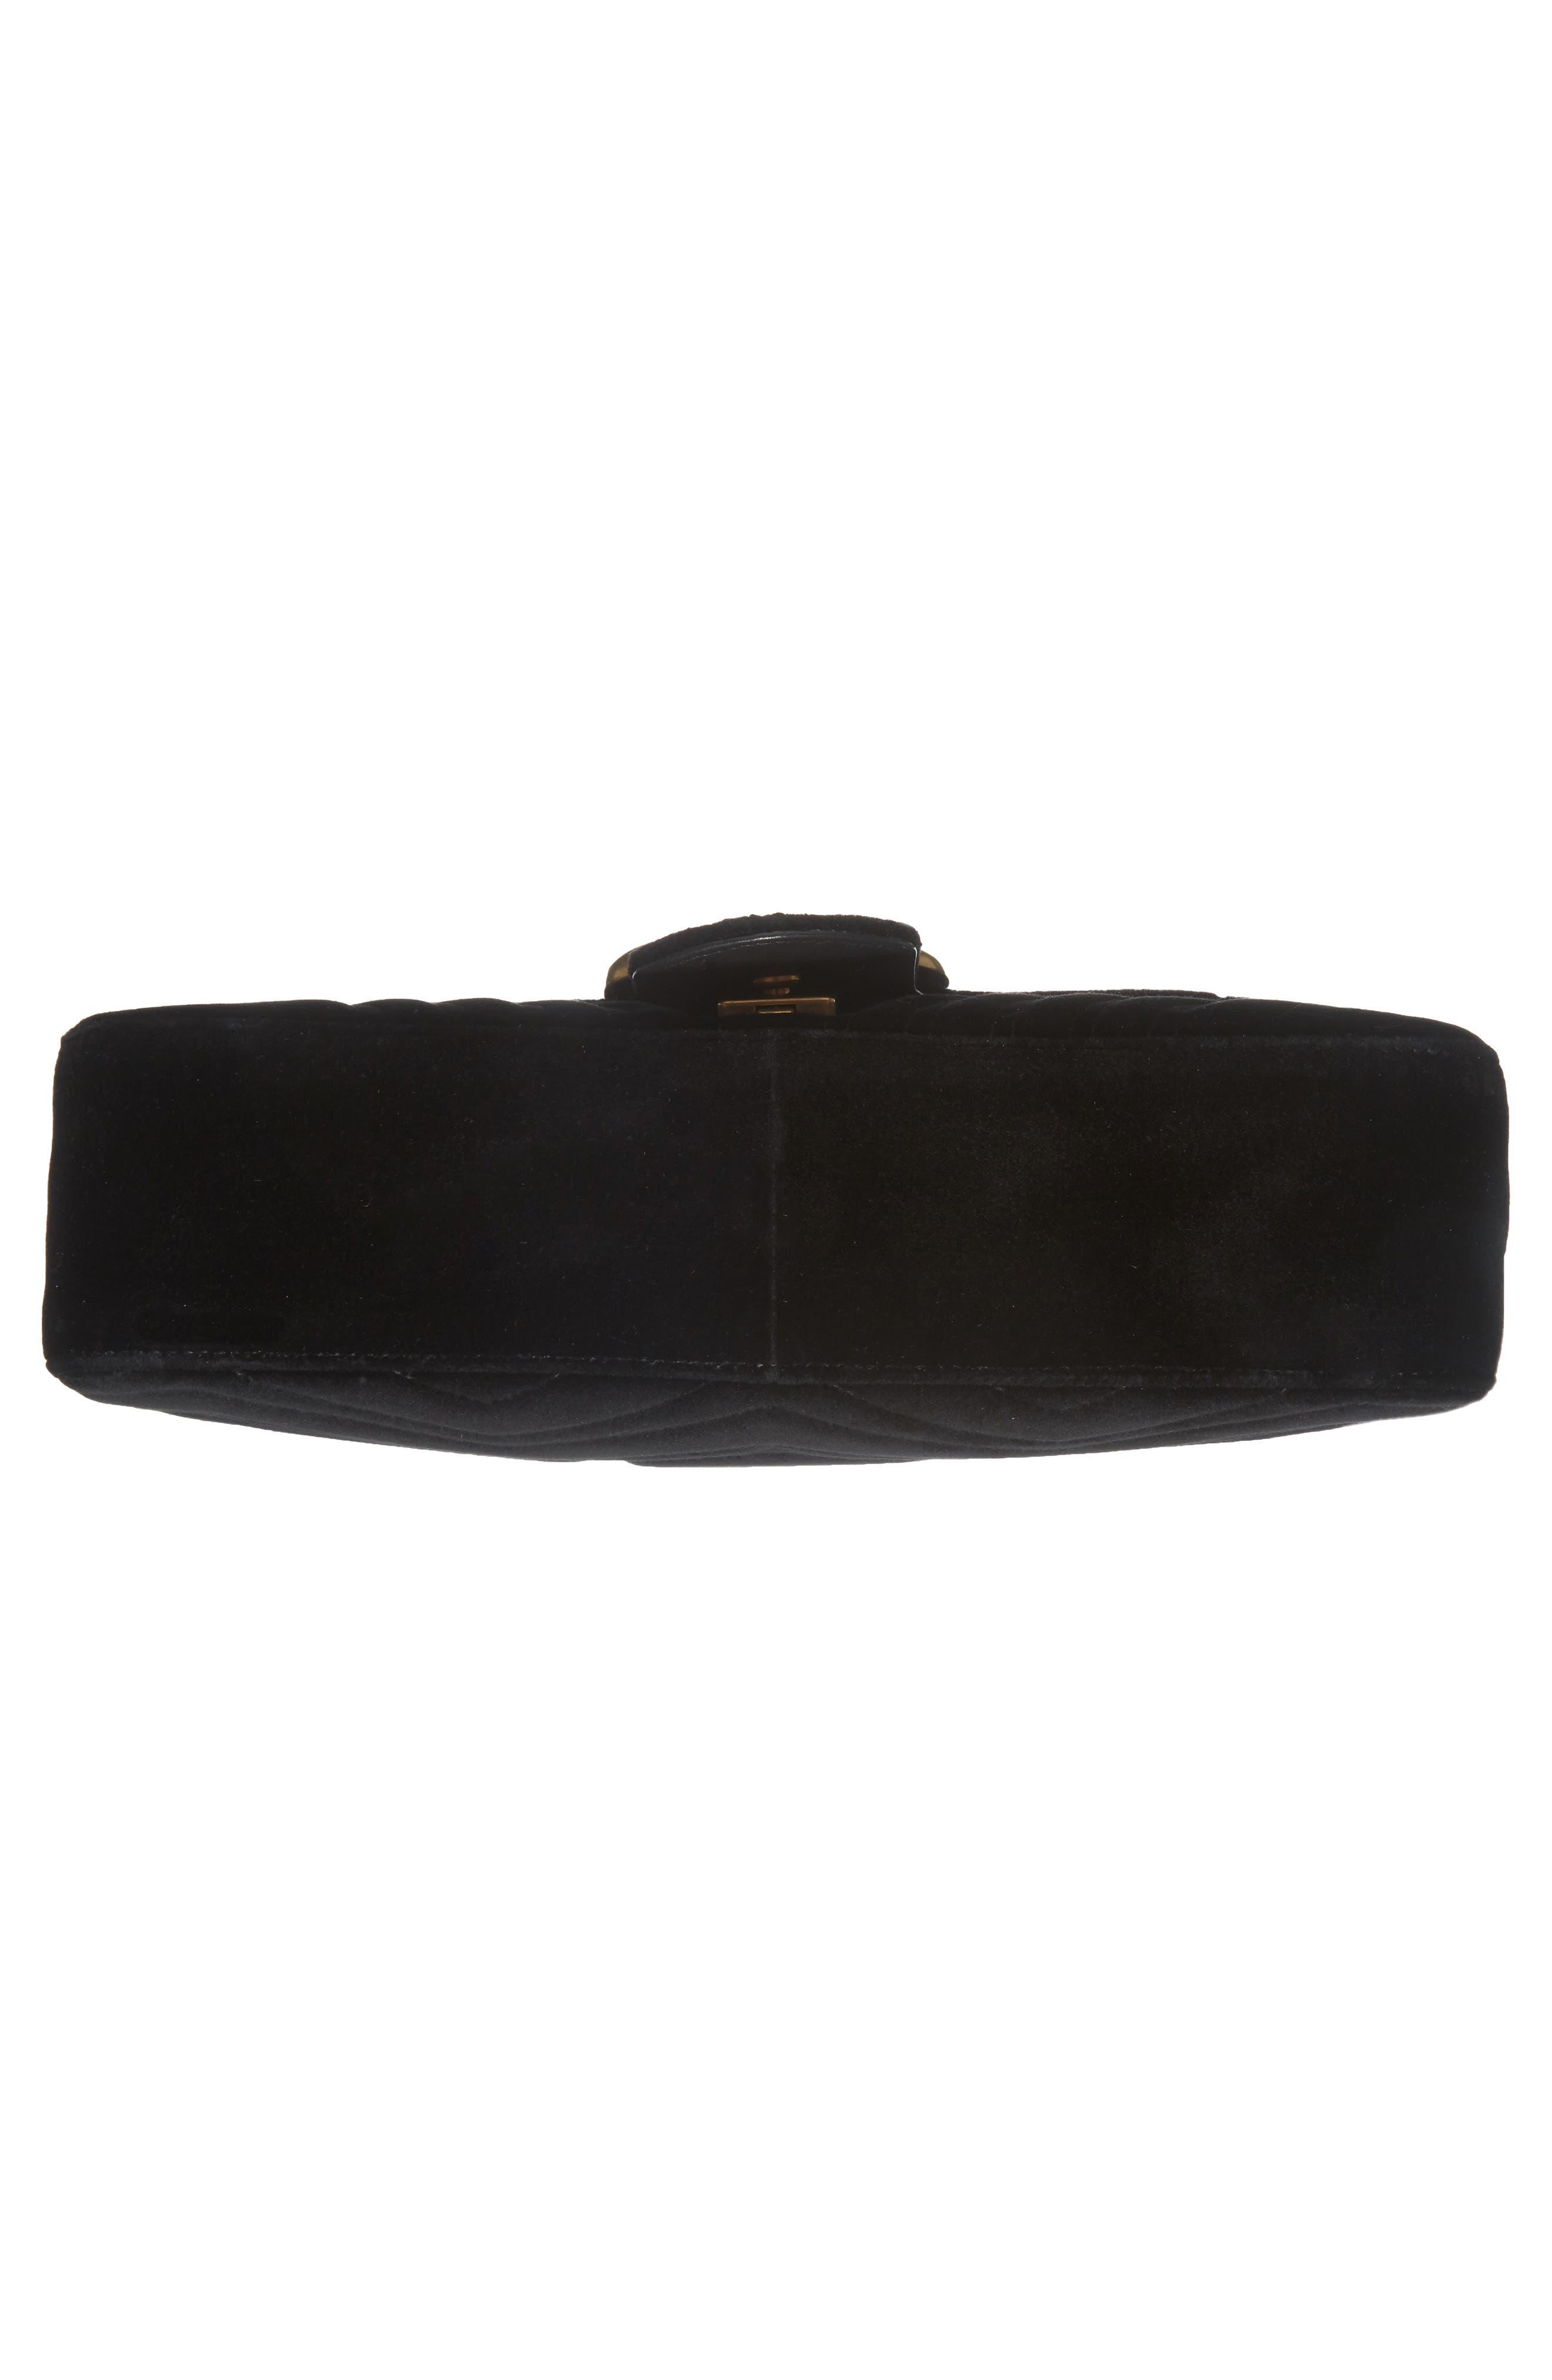 GUCCI, Medium GG Marmont 2.0 Matelassé Velvet Shoulder Bag, Alternate thumbnail 6, color, NERO